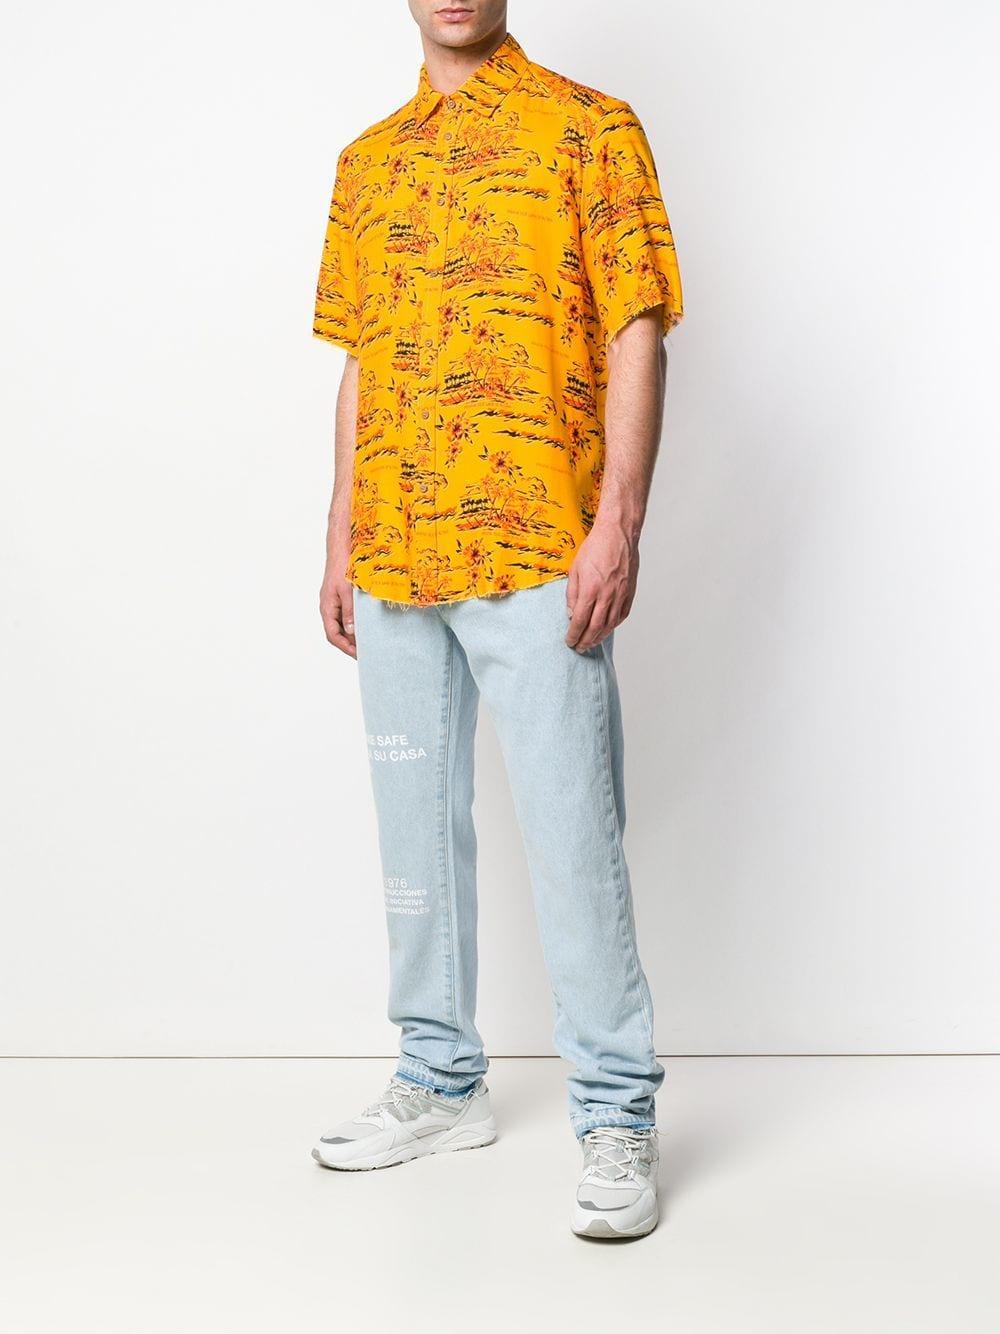 d8d9d4092 Lyst - Mauna Kea Tropical Print Shirt in Orange for Men